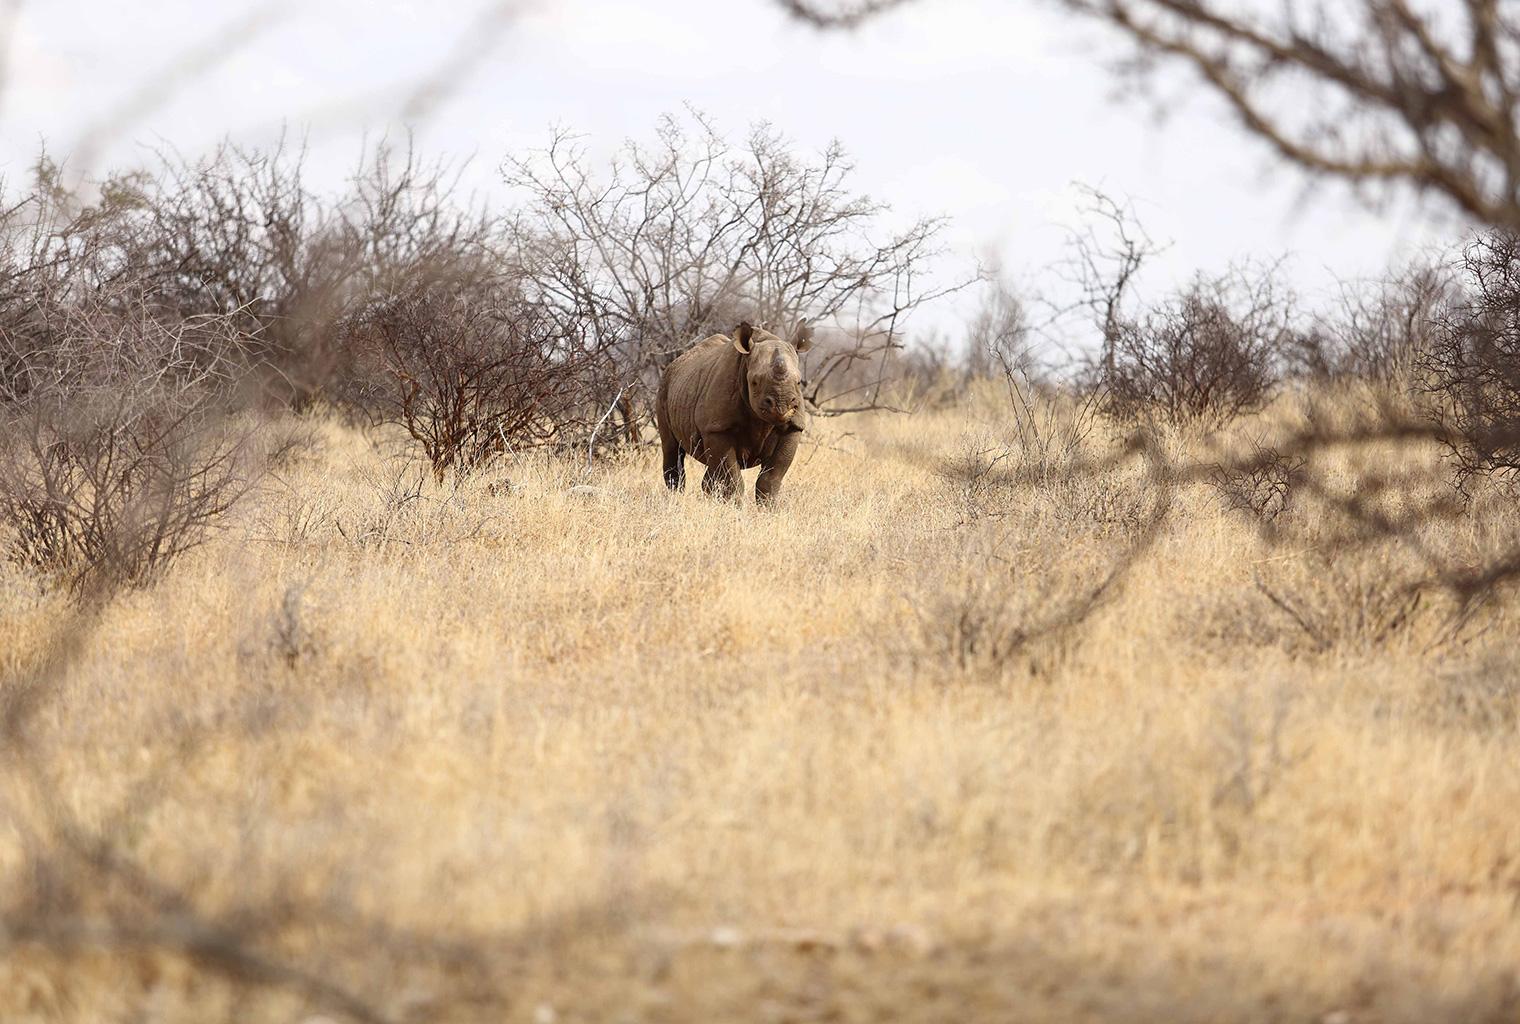 Saruni-Rhino-Tracking-Kenya-Rhinos